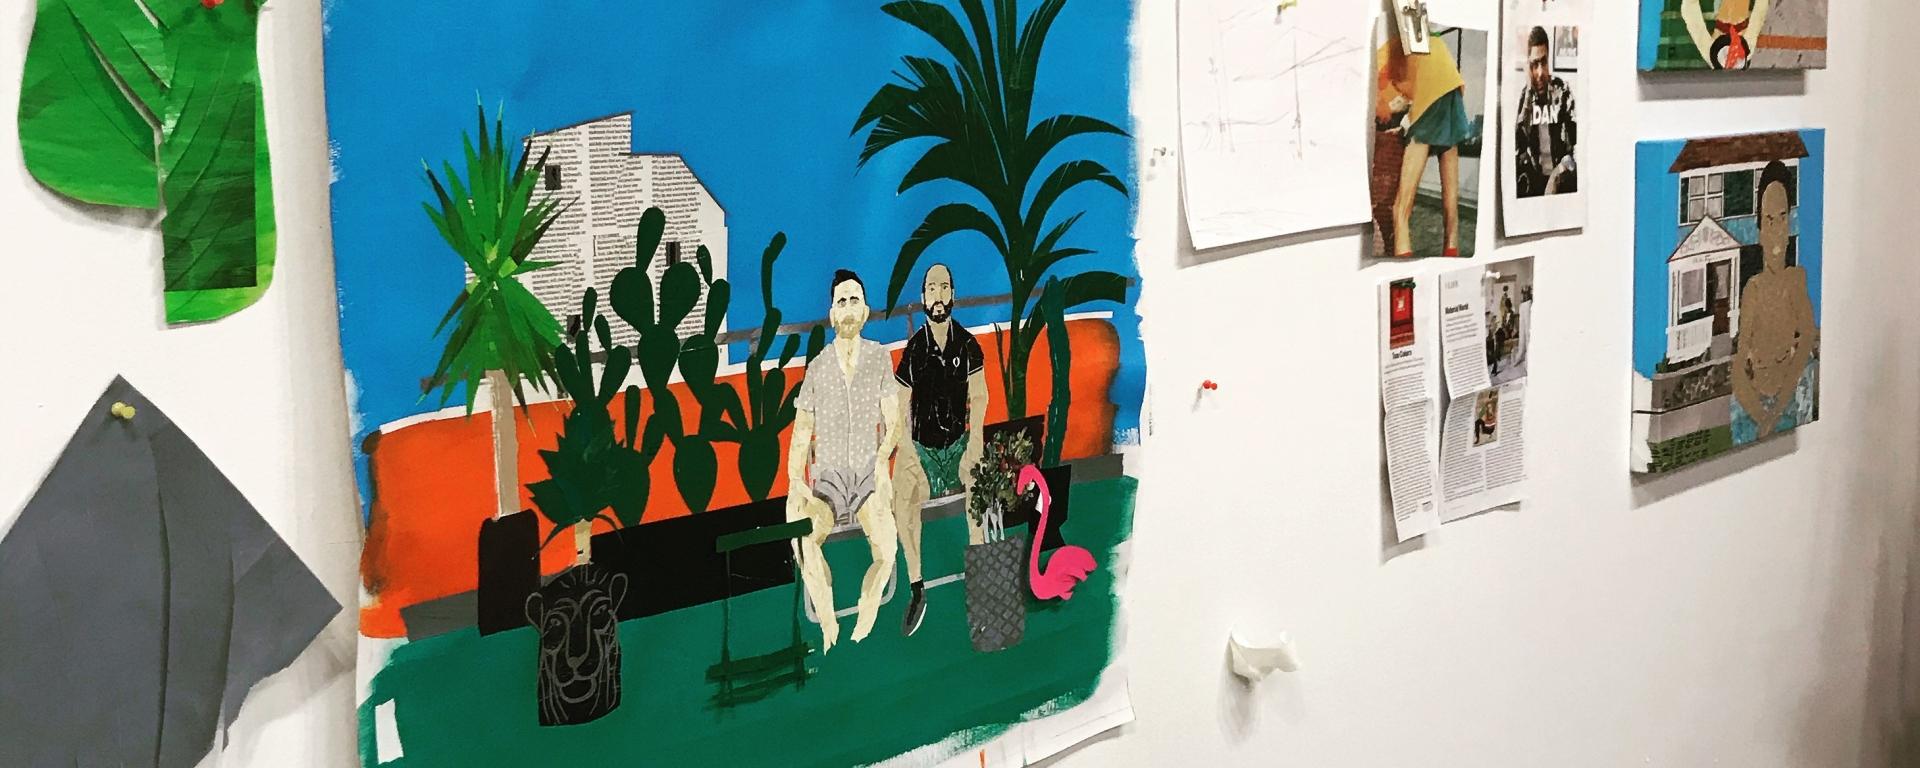 Inside the artist Ray Monde's studio